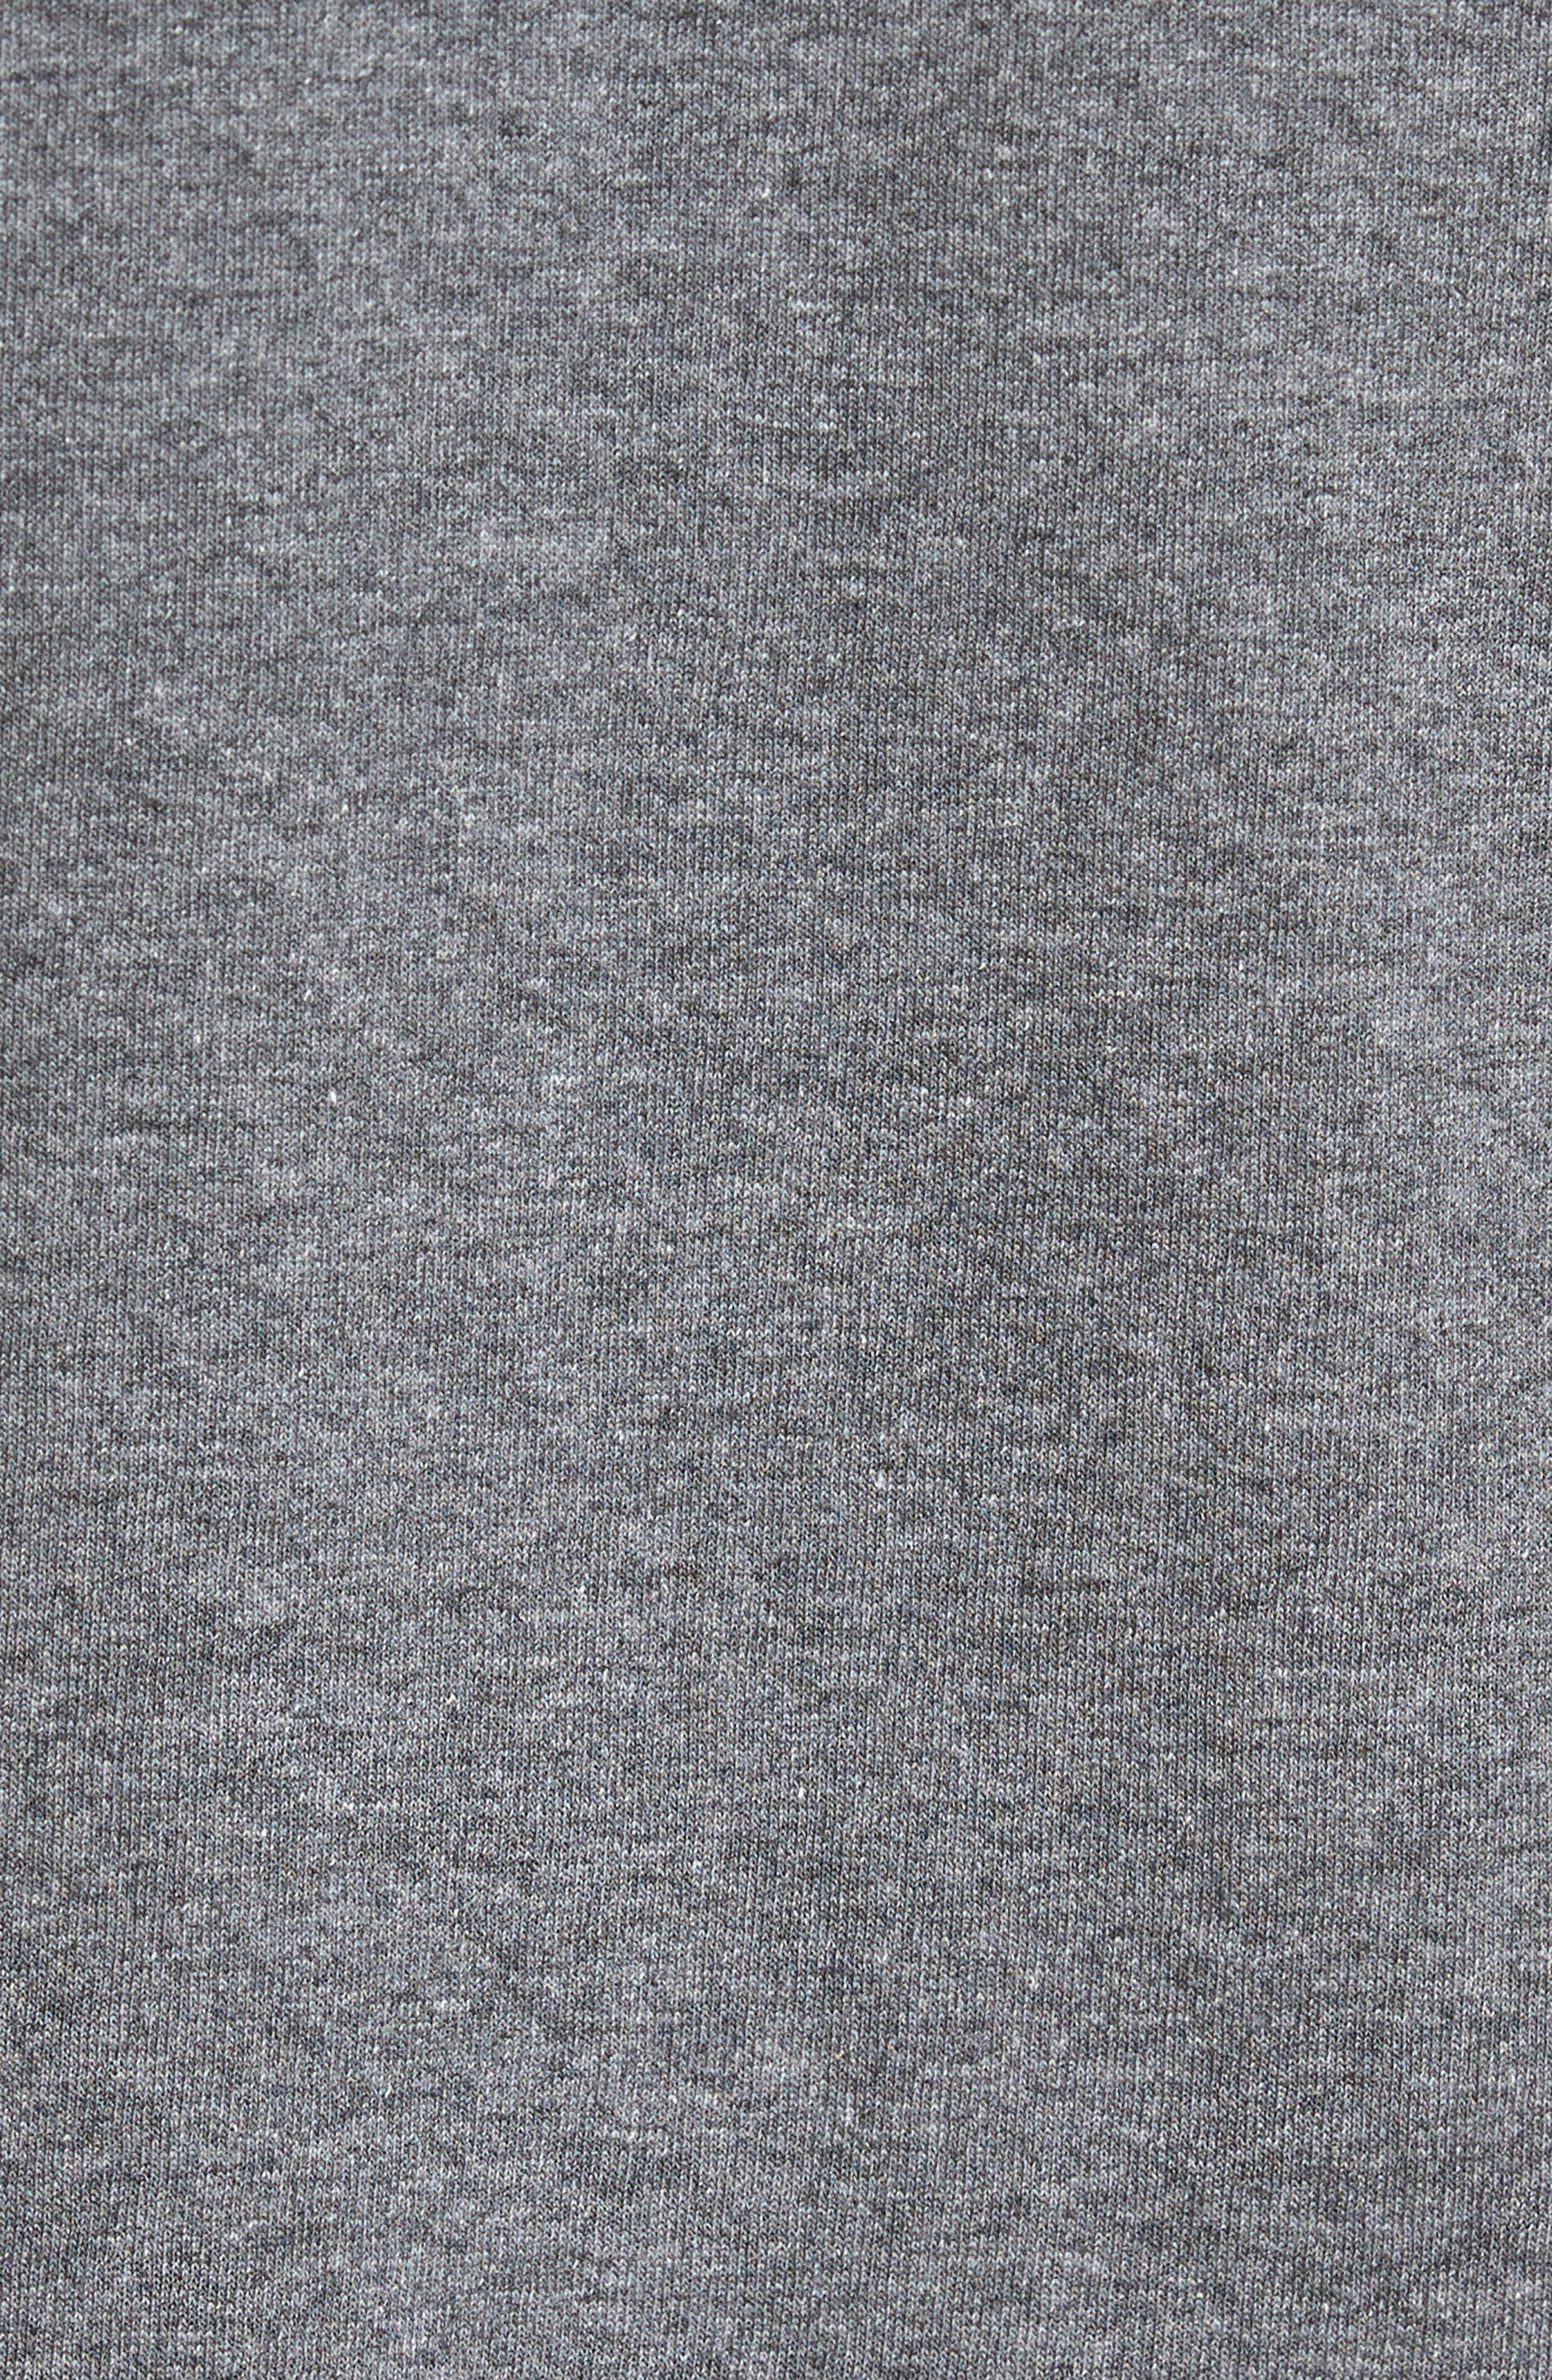 Misfits Short Sleeve T-Shirt,                             Alternate thumbnail 5, color,